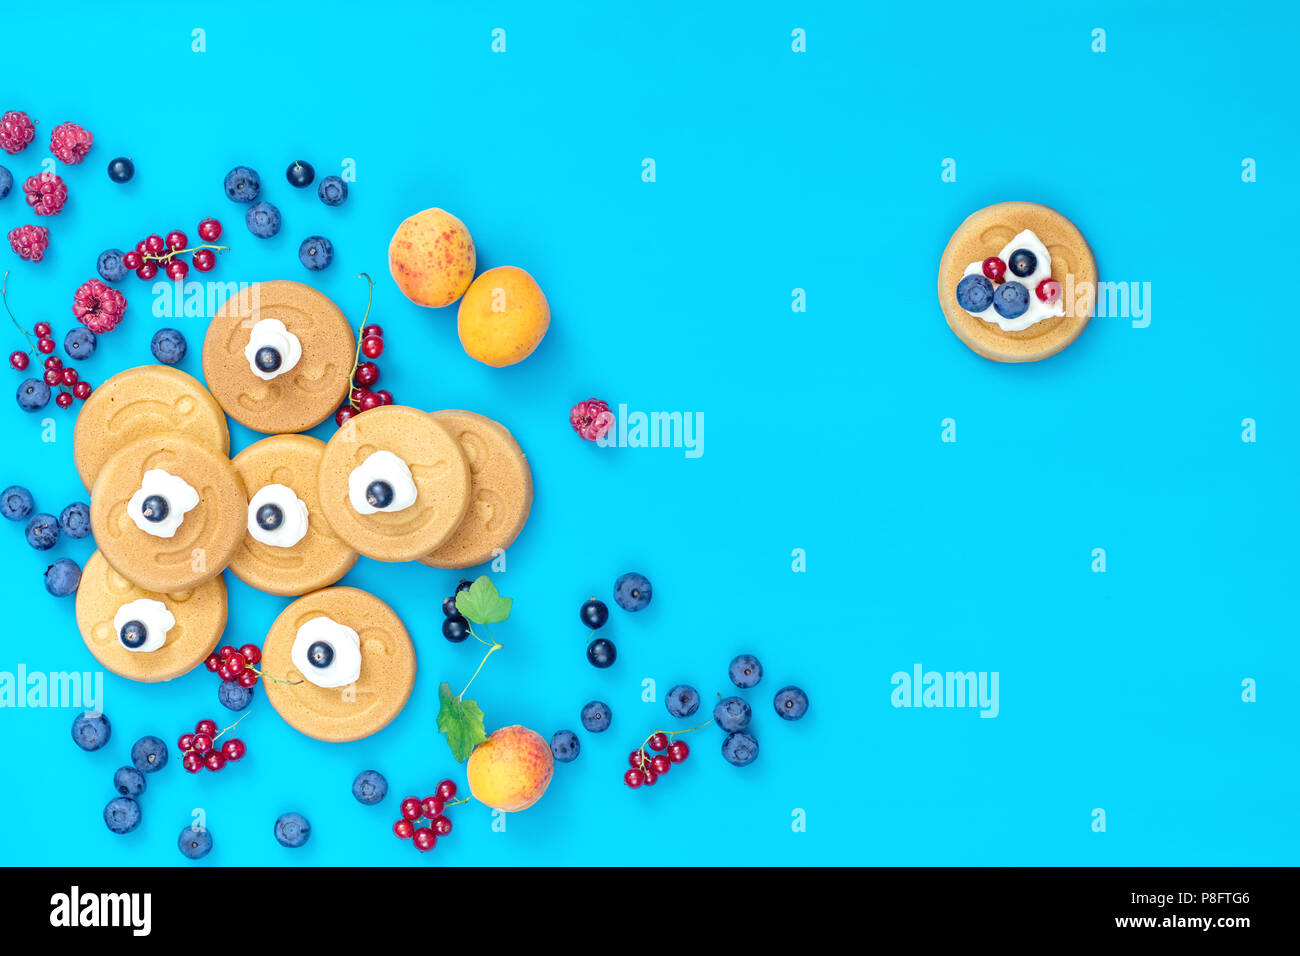 Deliciosa sonrisa mini panqueques con bayas en superficie azul, vista superior. Sentar planas, vista superior alimentos dulces de fondo. Imagen De Stock